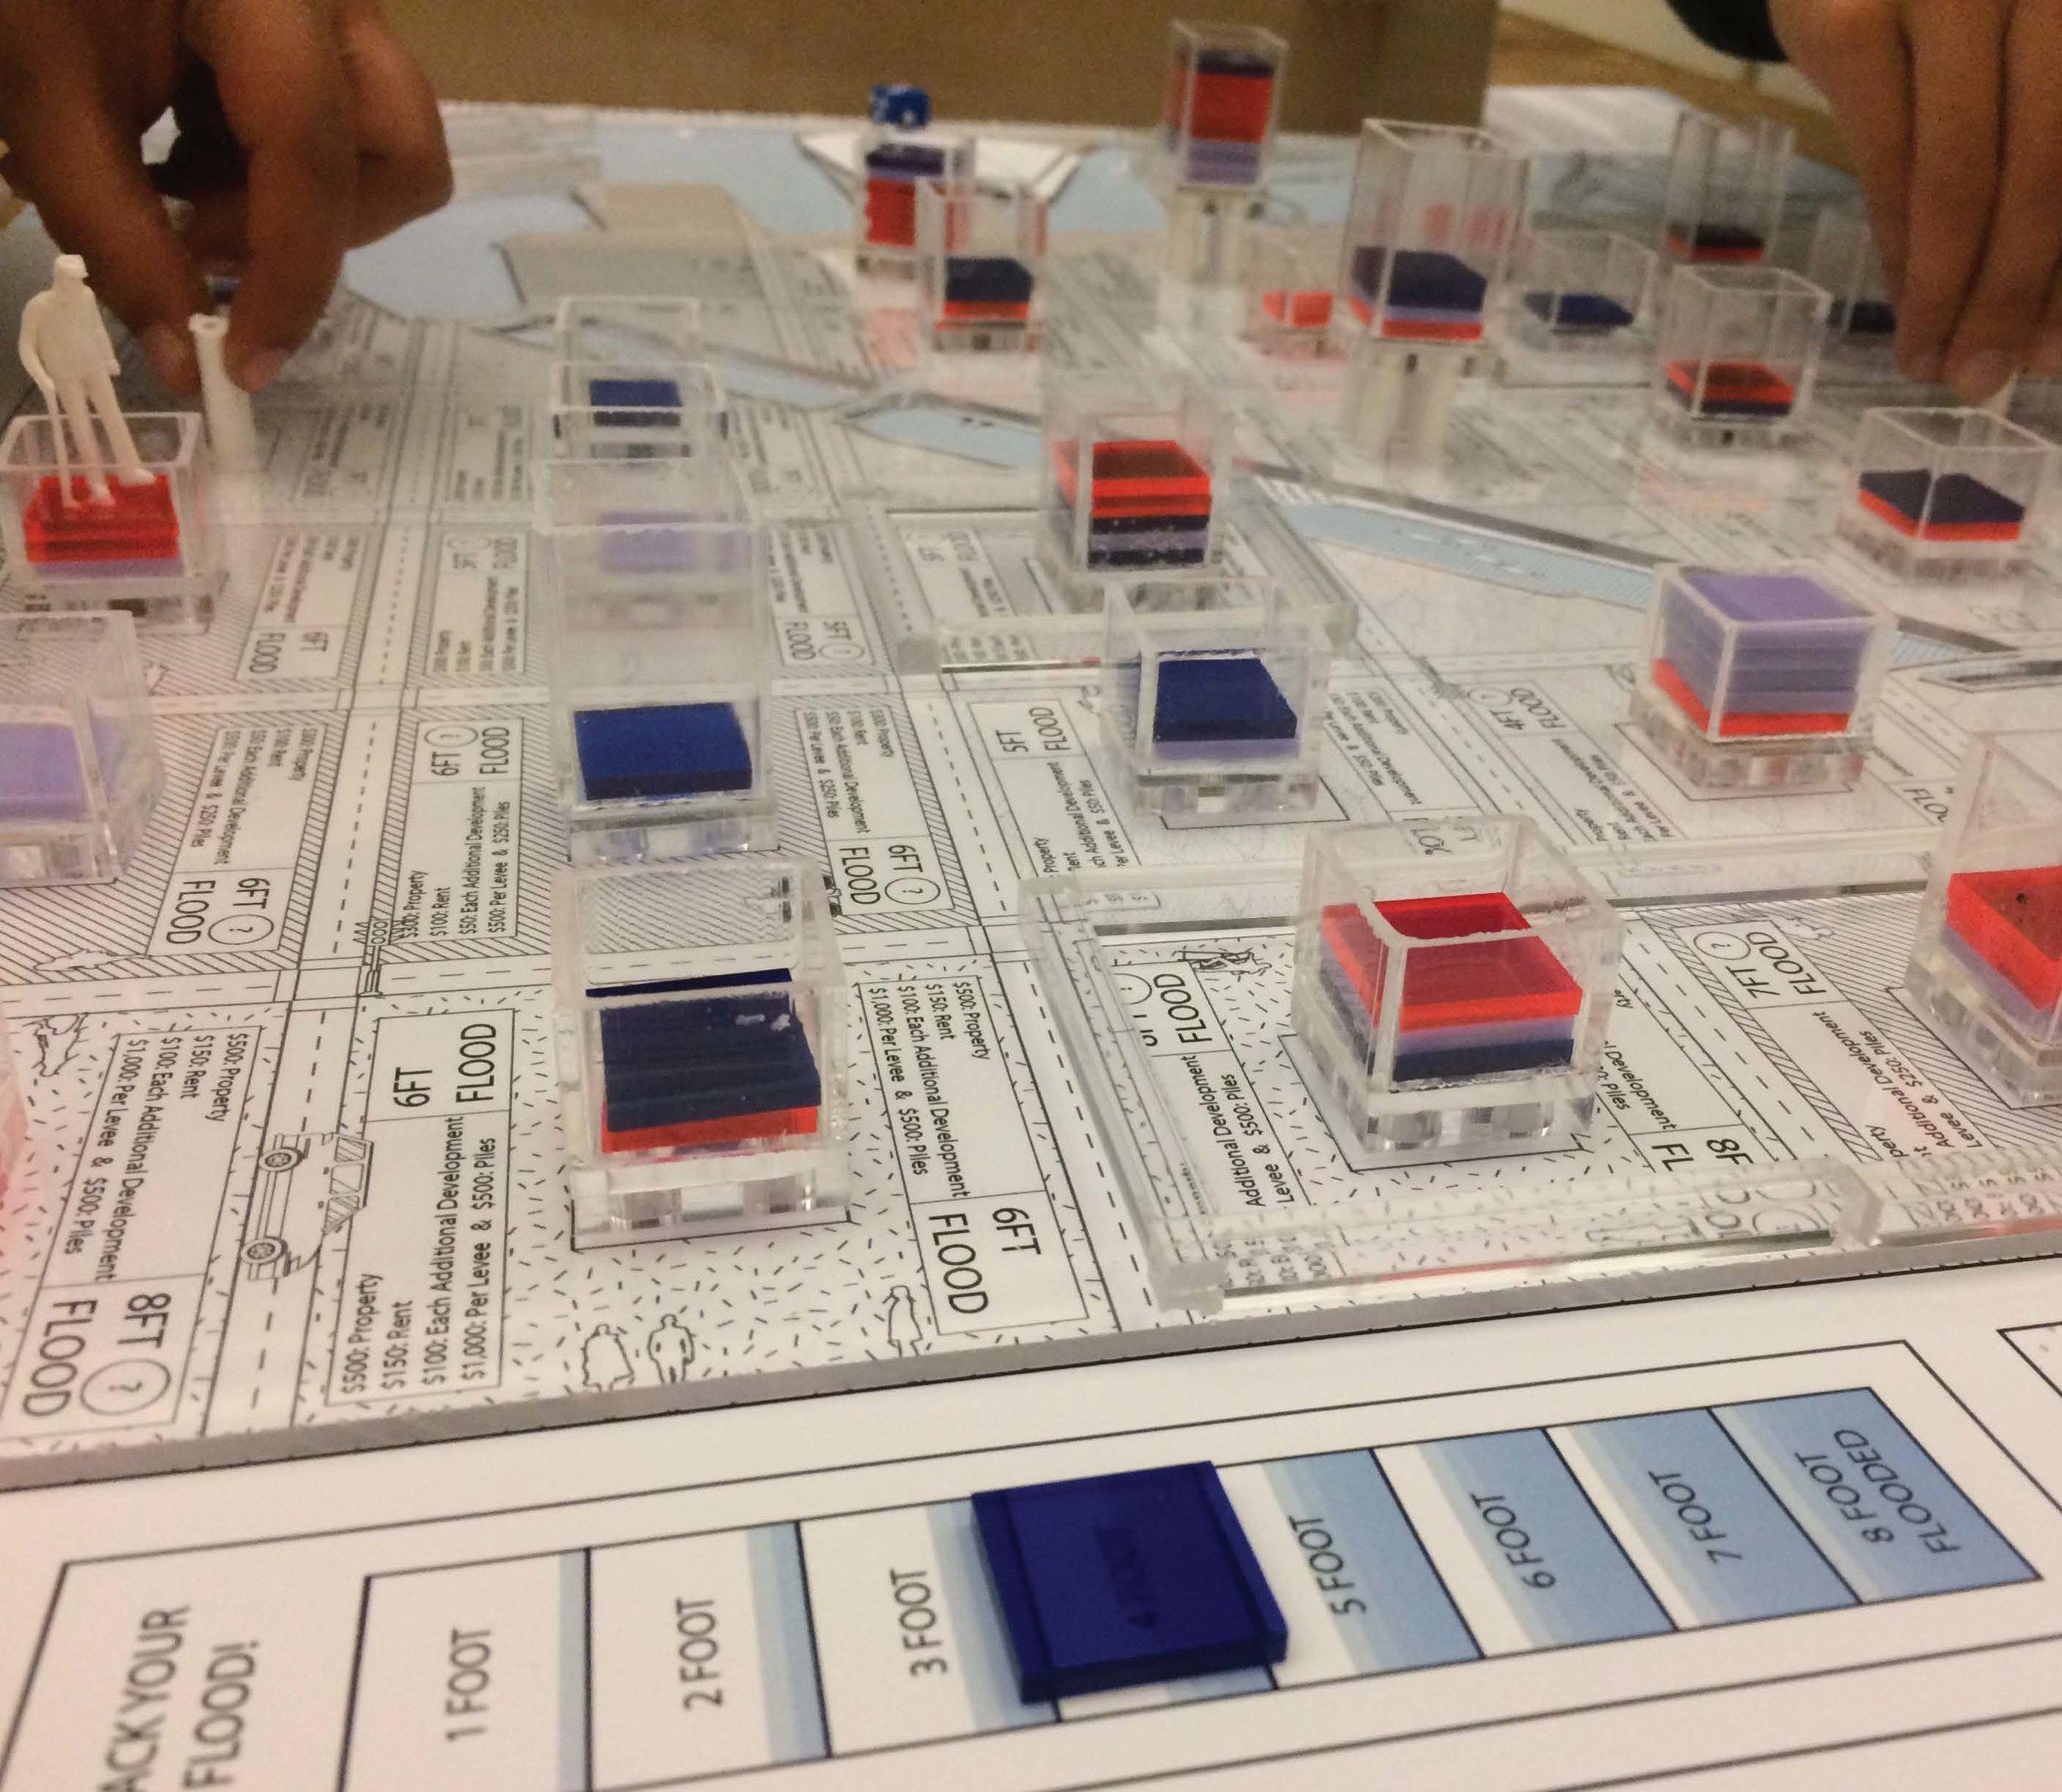 Mission Bay board game by Sarah Herlugson, Manasi Kshirsagar, Trenton Jewett, and Shailee Shah.